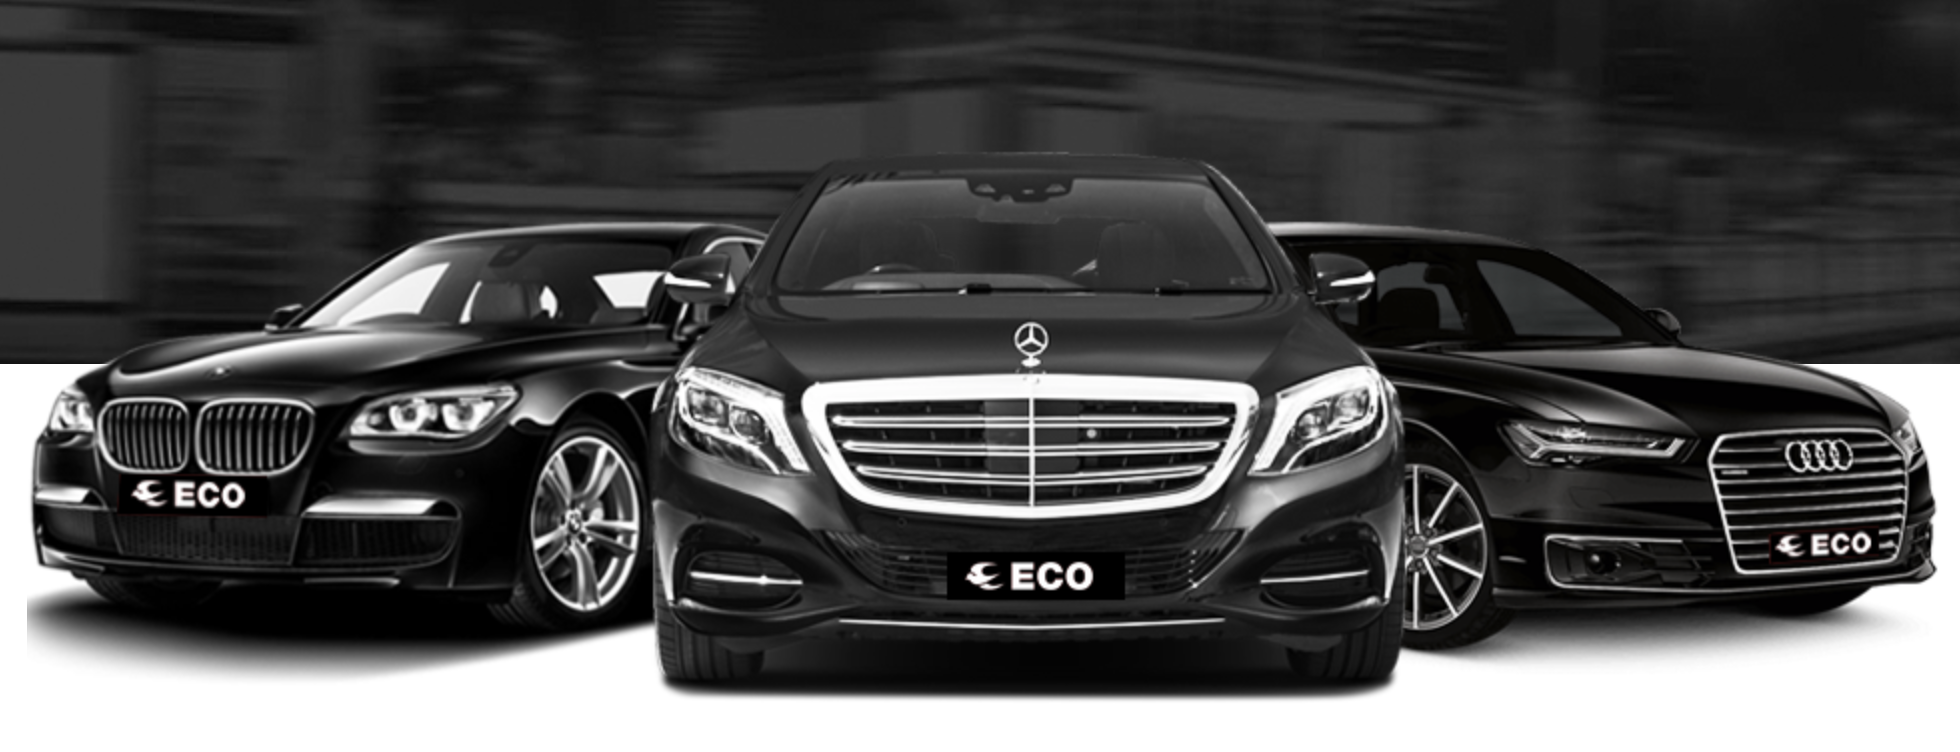 Amex Offer - Eco Rent a car